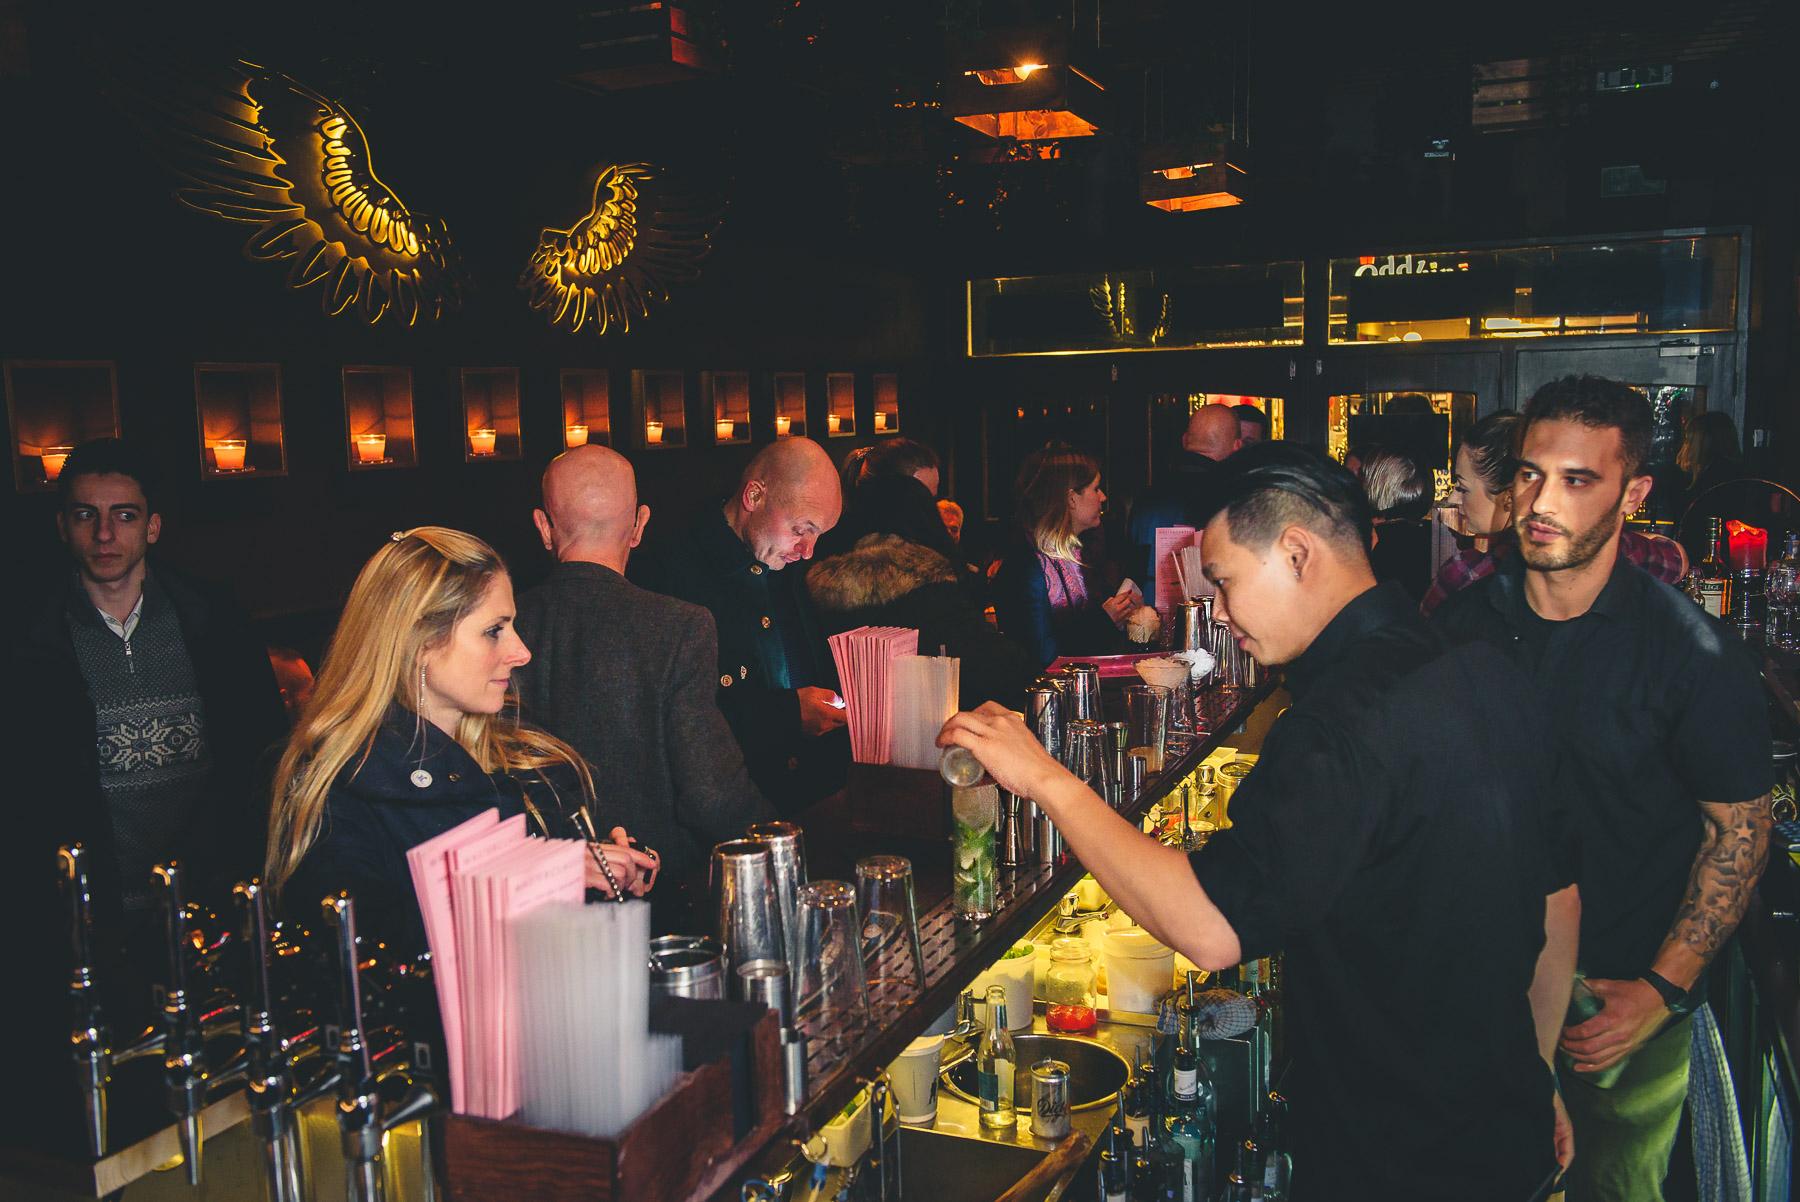 Angels cocktail bar Oxford_24.11.2018_640.jpg